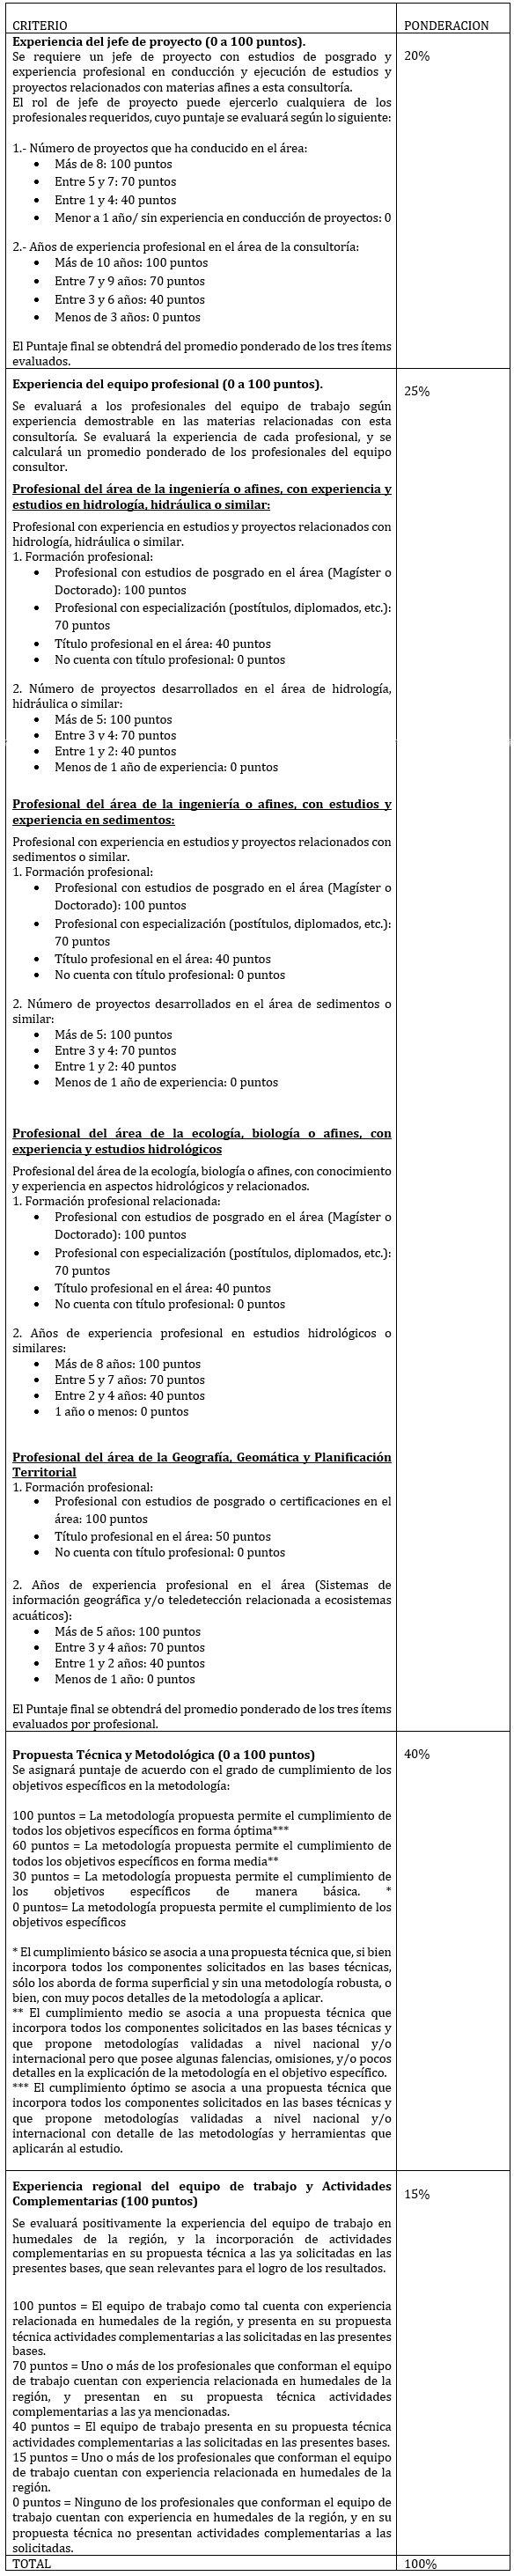 Criterios012021.jpg